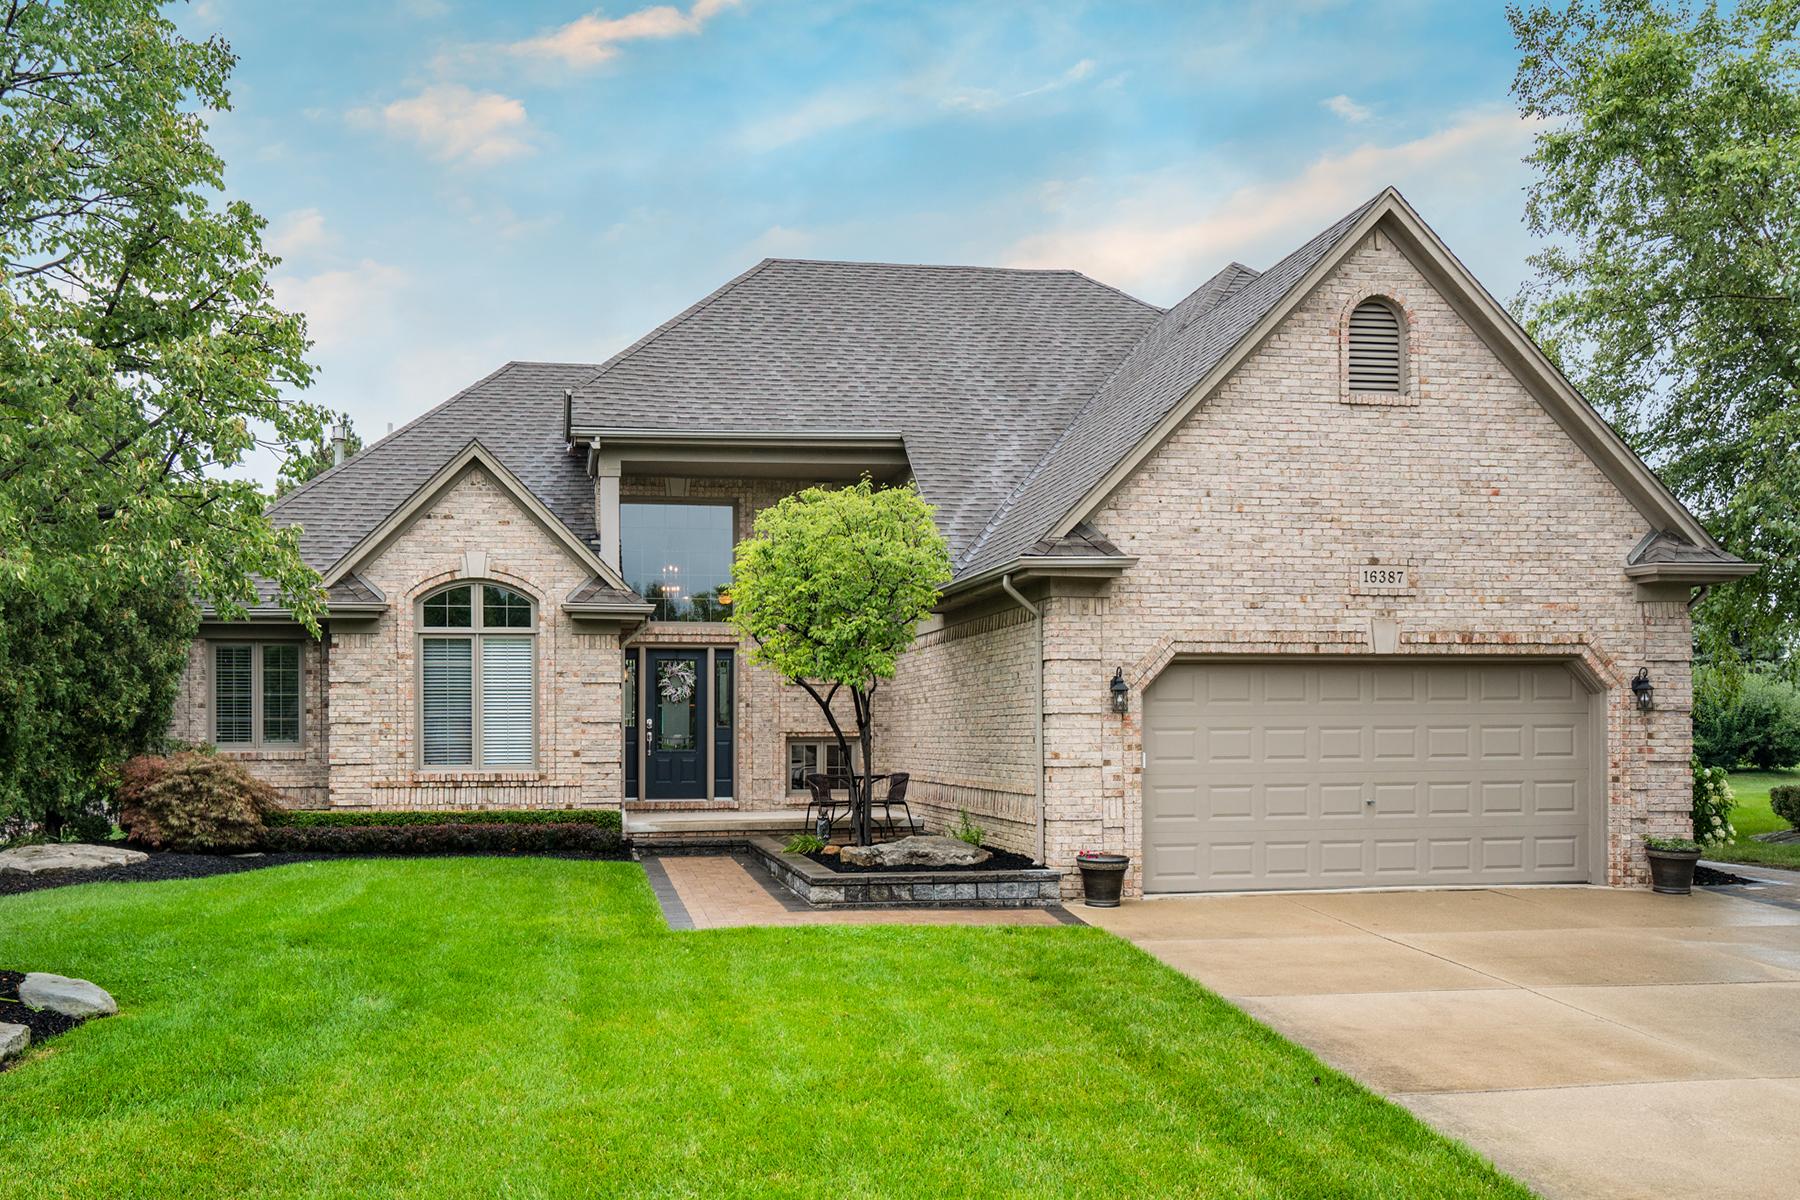 独户住宅 为 销售 在 Macomb Township 16387 Applewood Court, Macomb Township, 密歇根州, 48042 美国